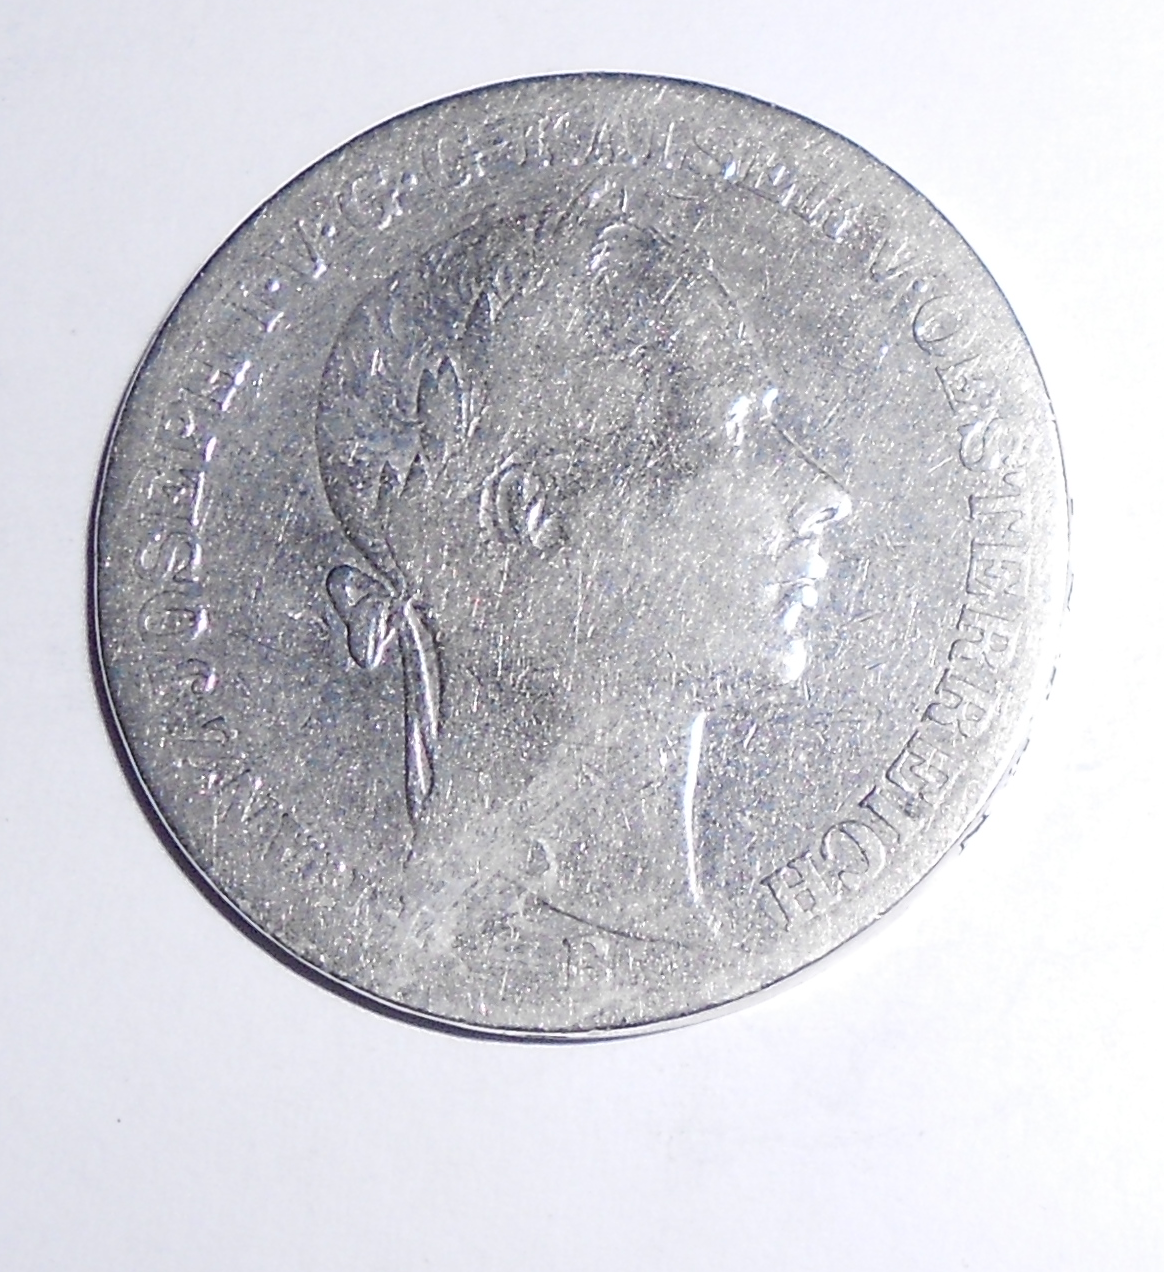 Uhry Tolar 1865 B